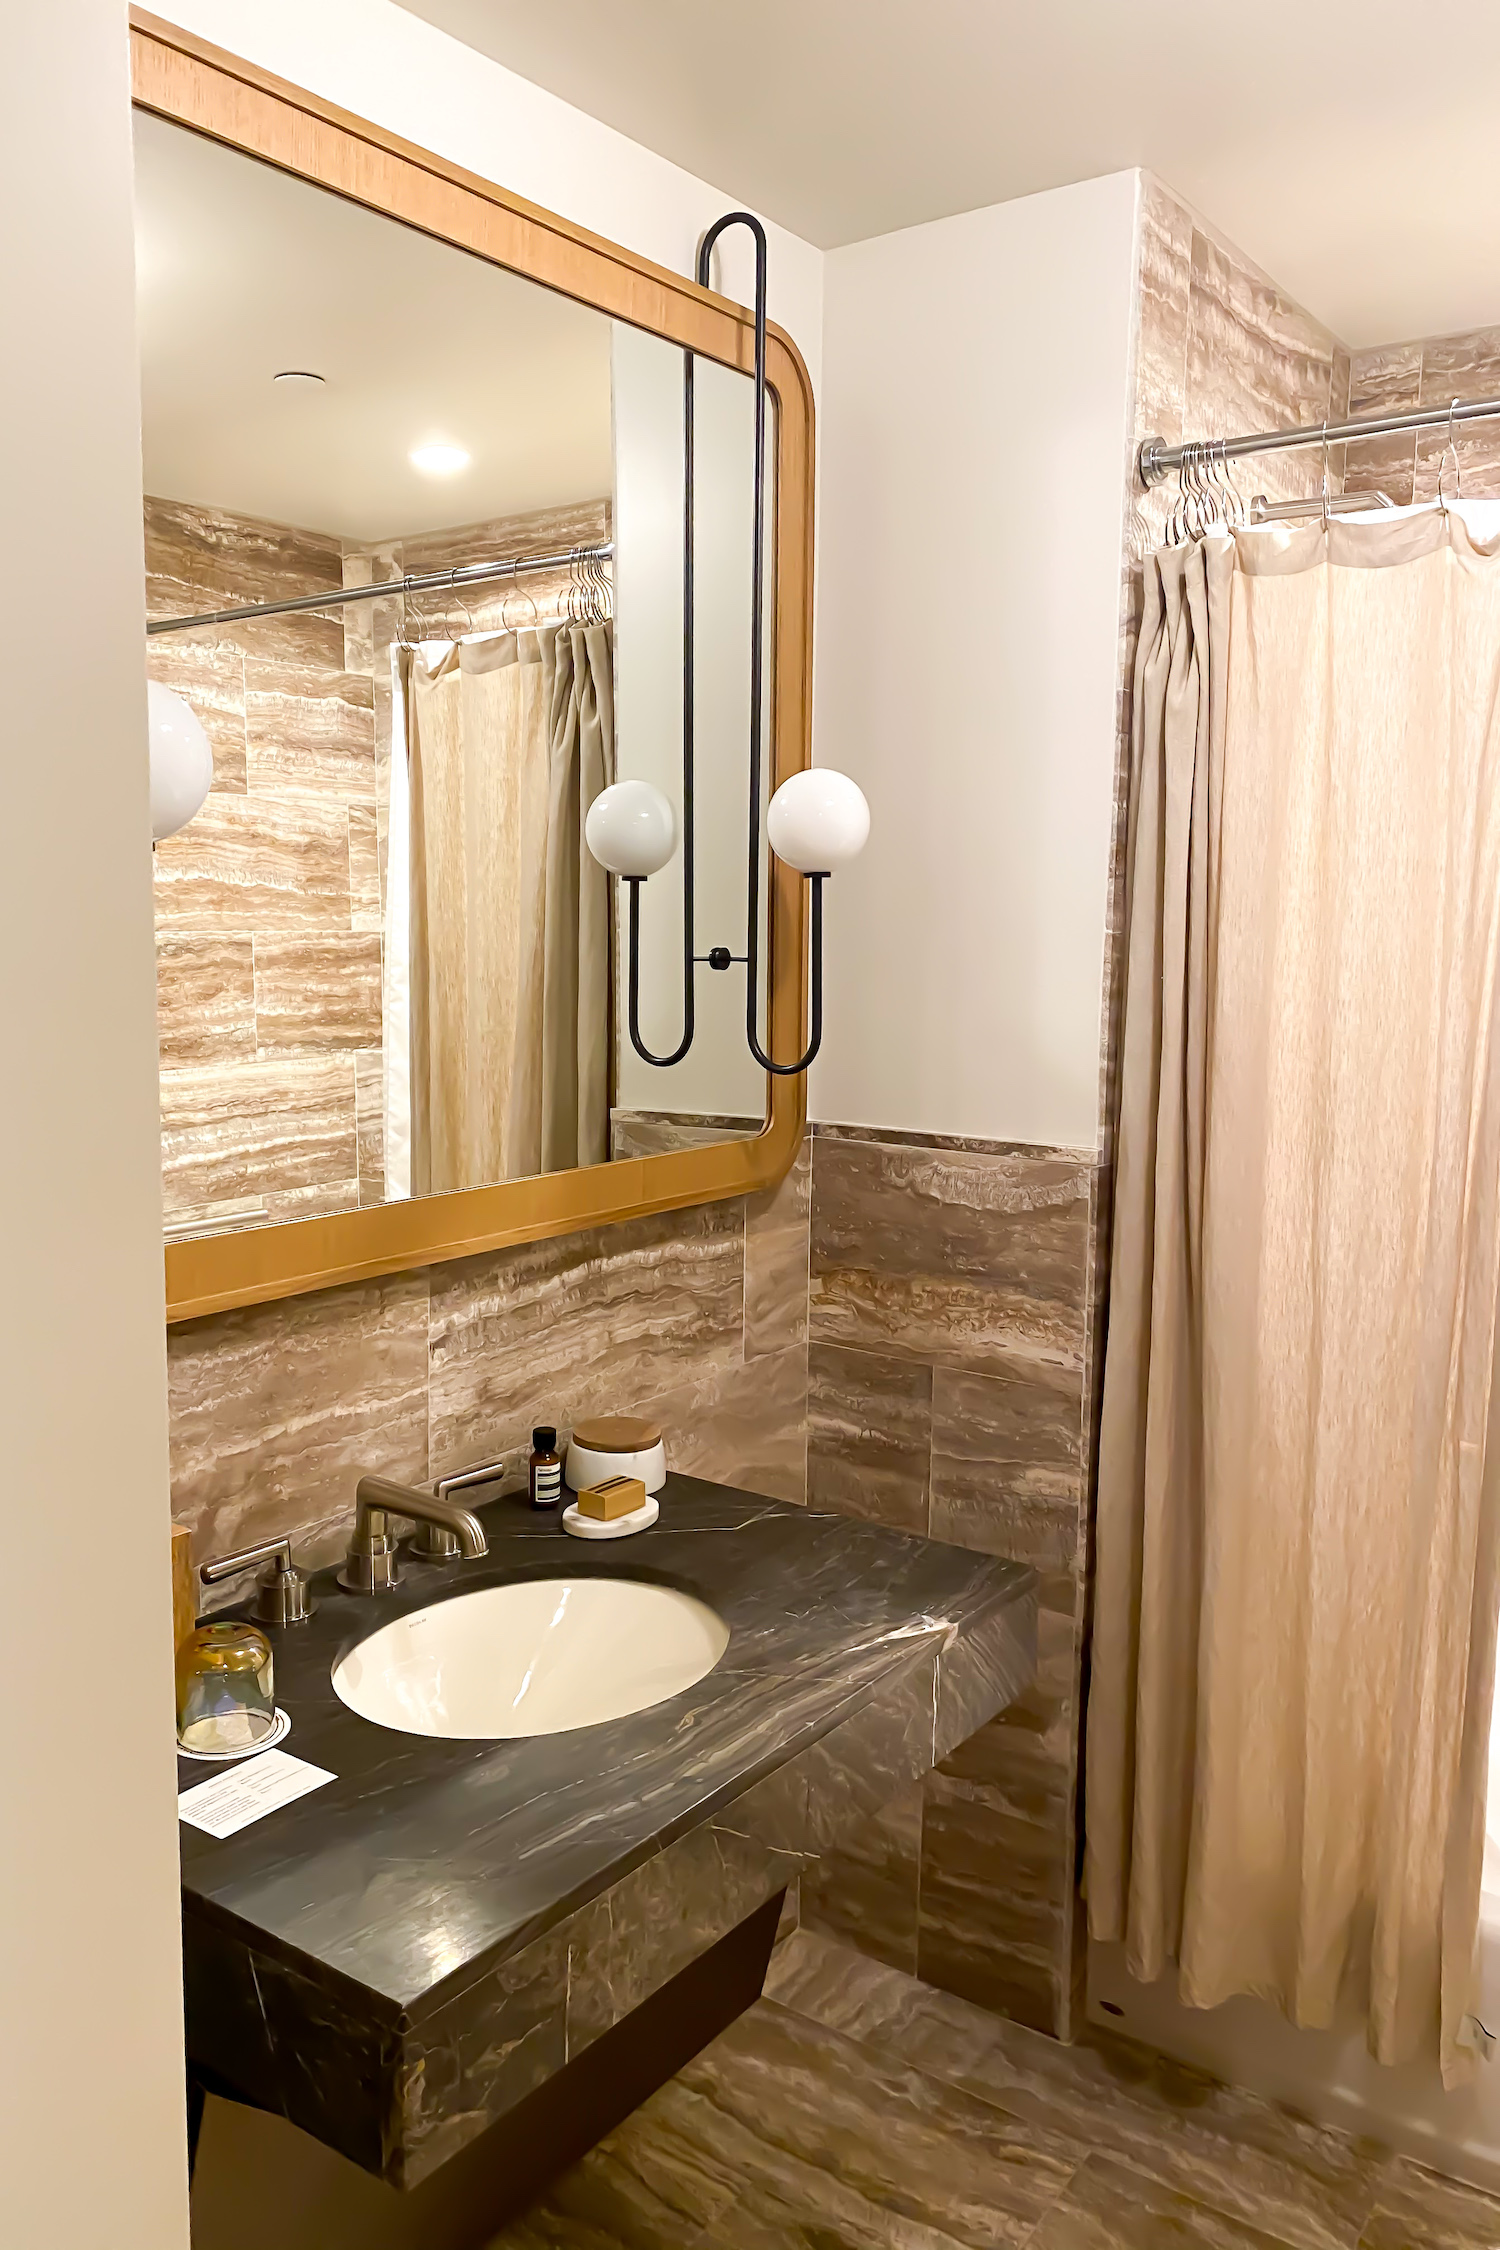 The Proper Hotel bathroom